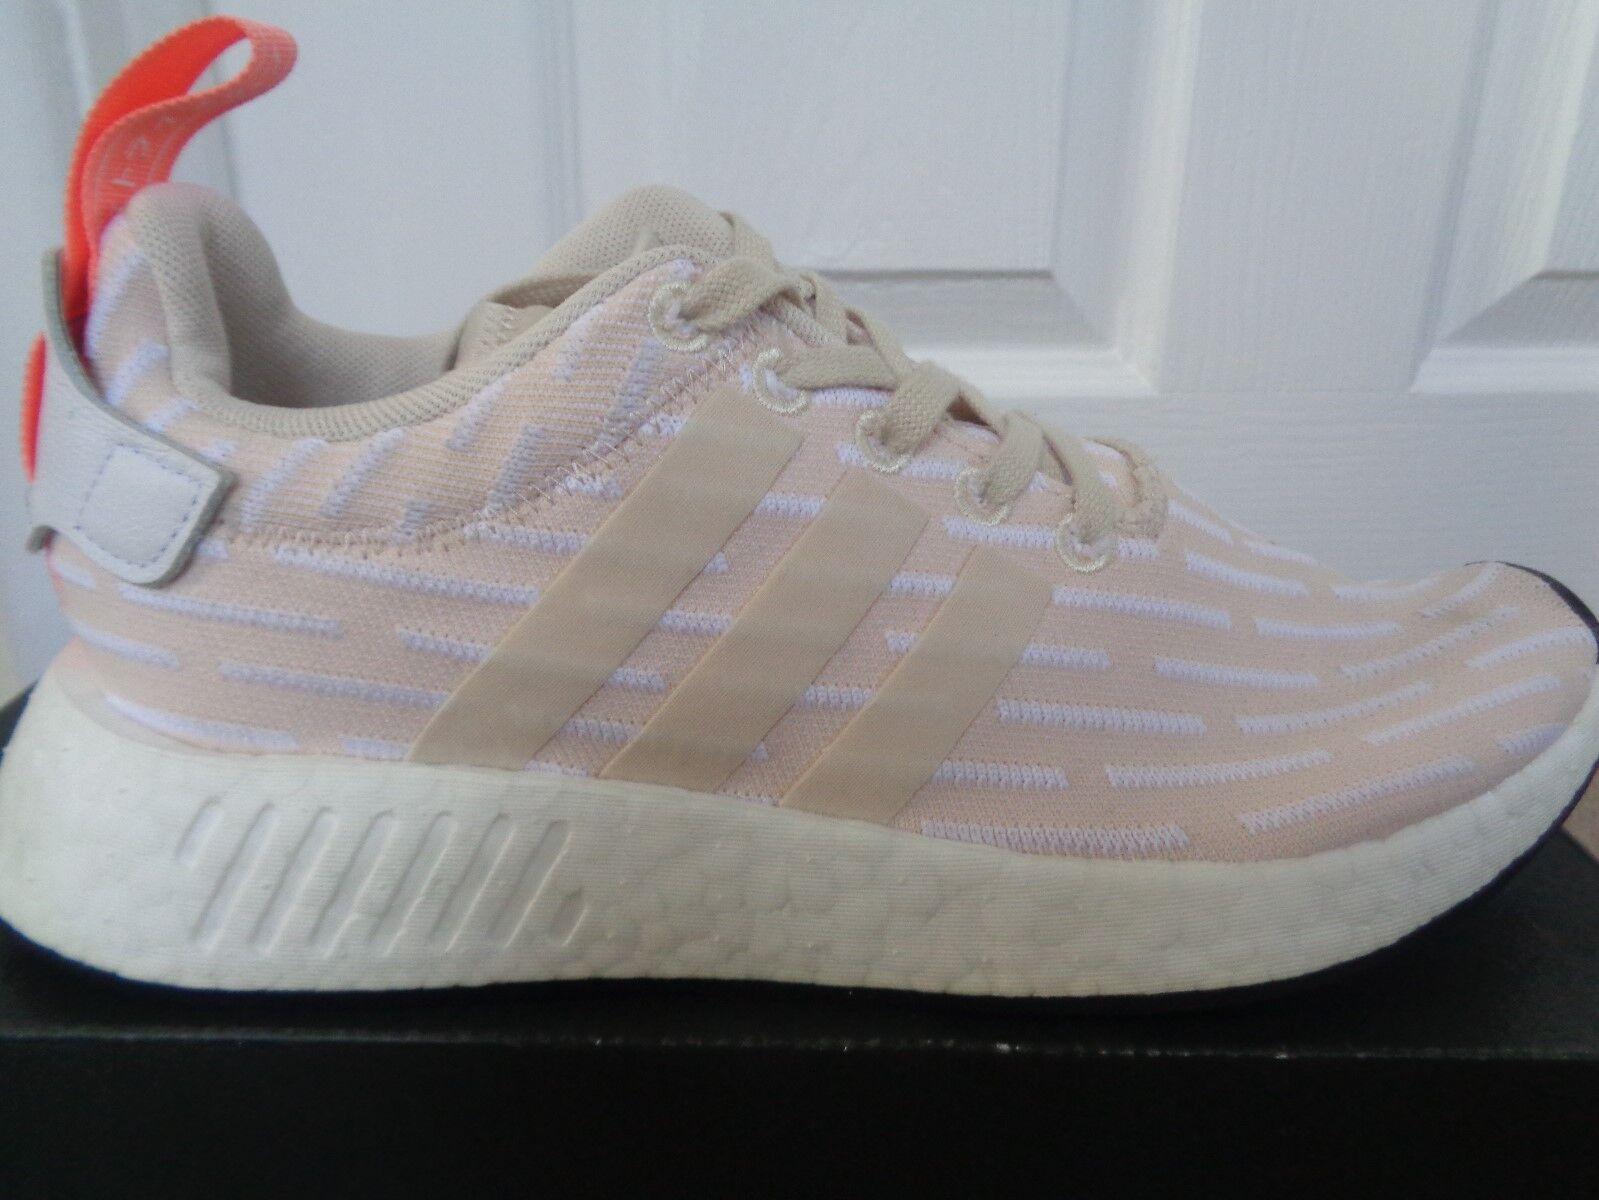 Adidas Originals NMD_R2 Wmns Baskets Baskets BA7260 UK 6 EU 39 1/3 US 7.5 NEW